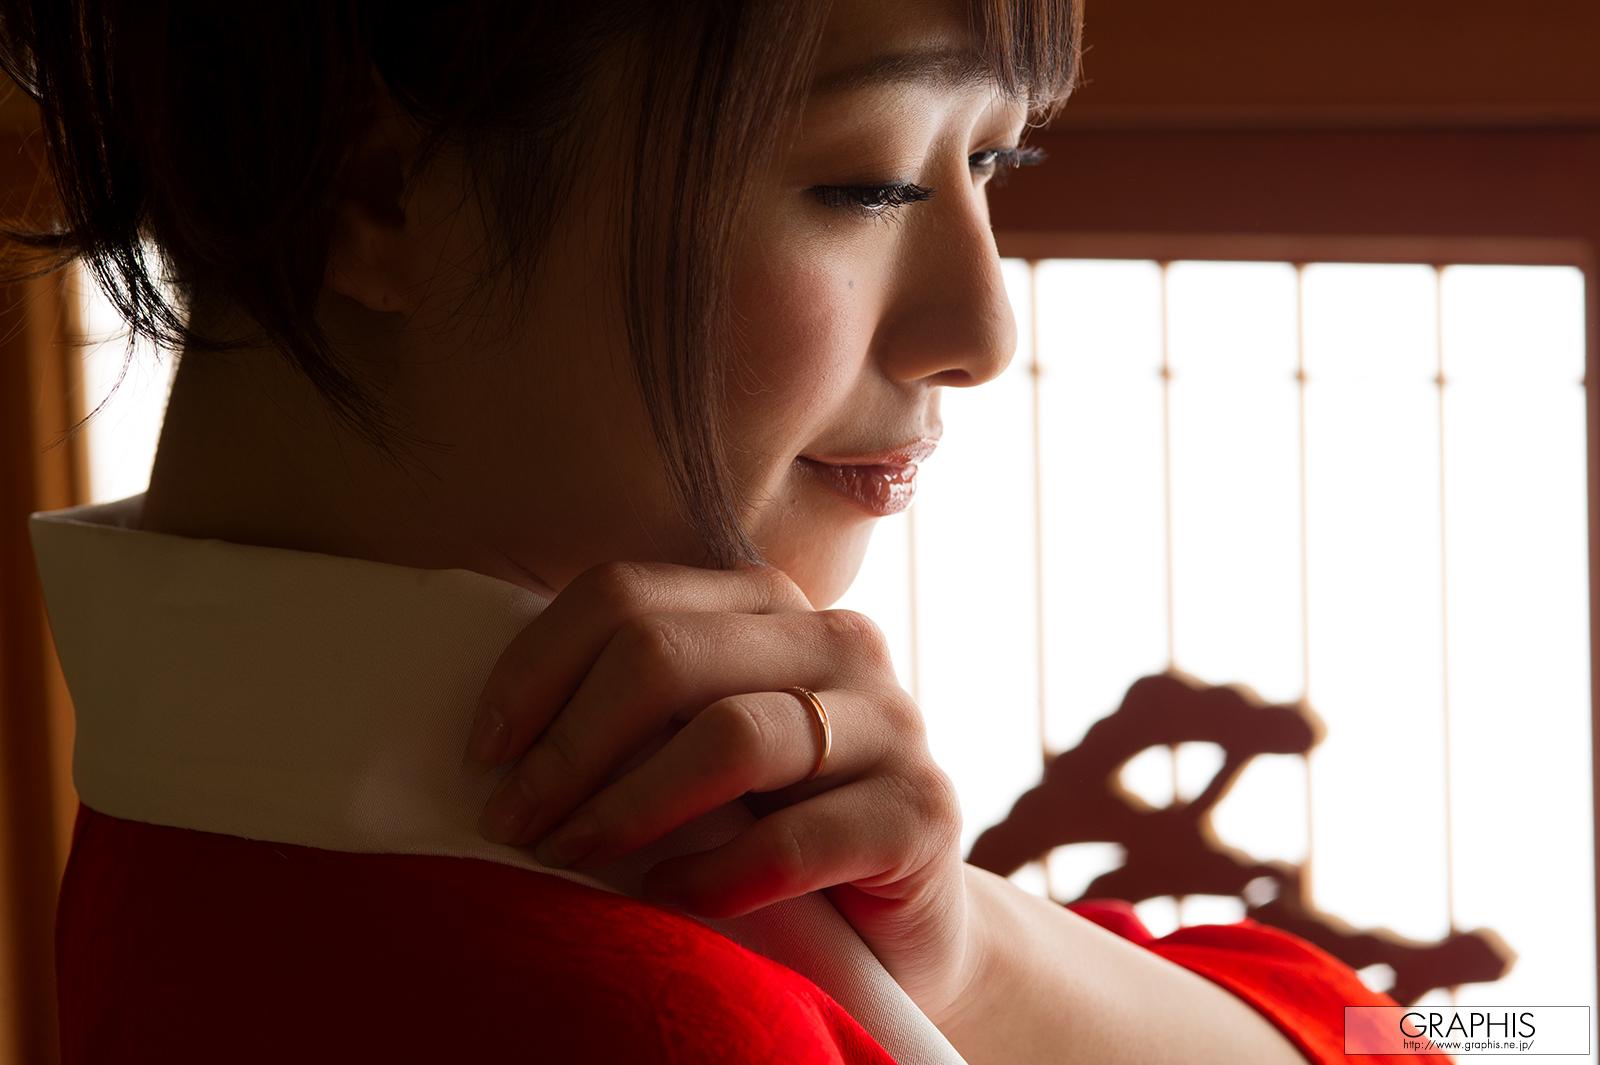 marina-shiraishi-red-kimono-boobs-naked-asian-graphis-03